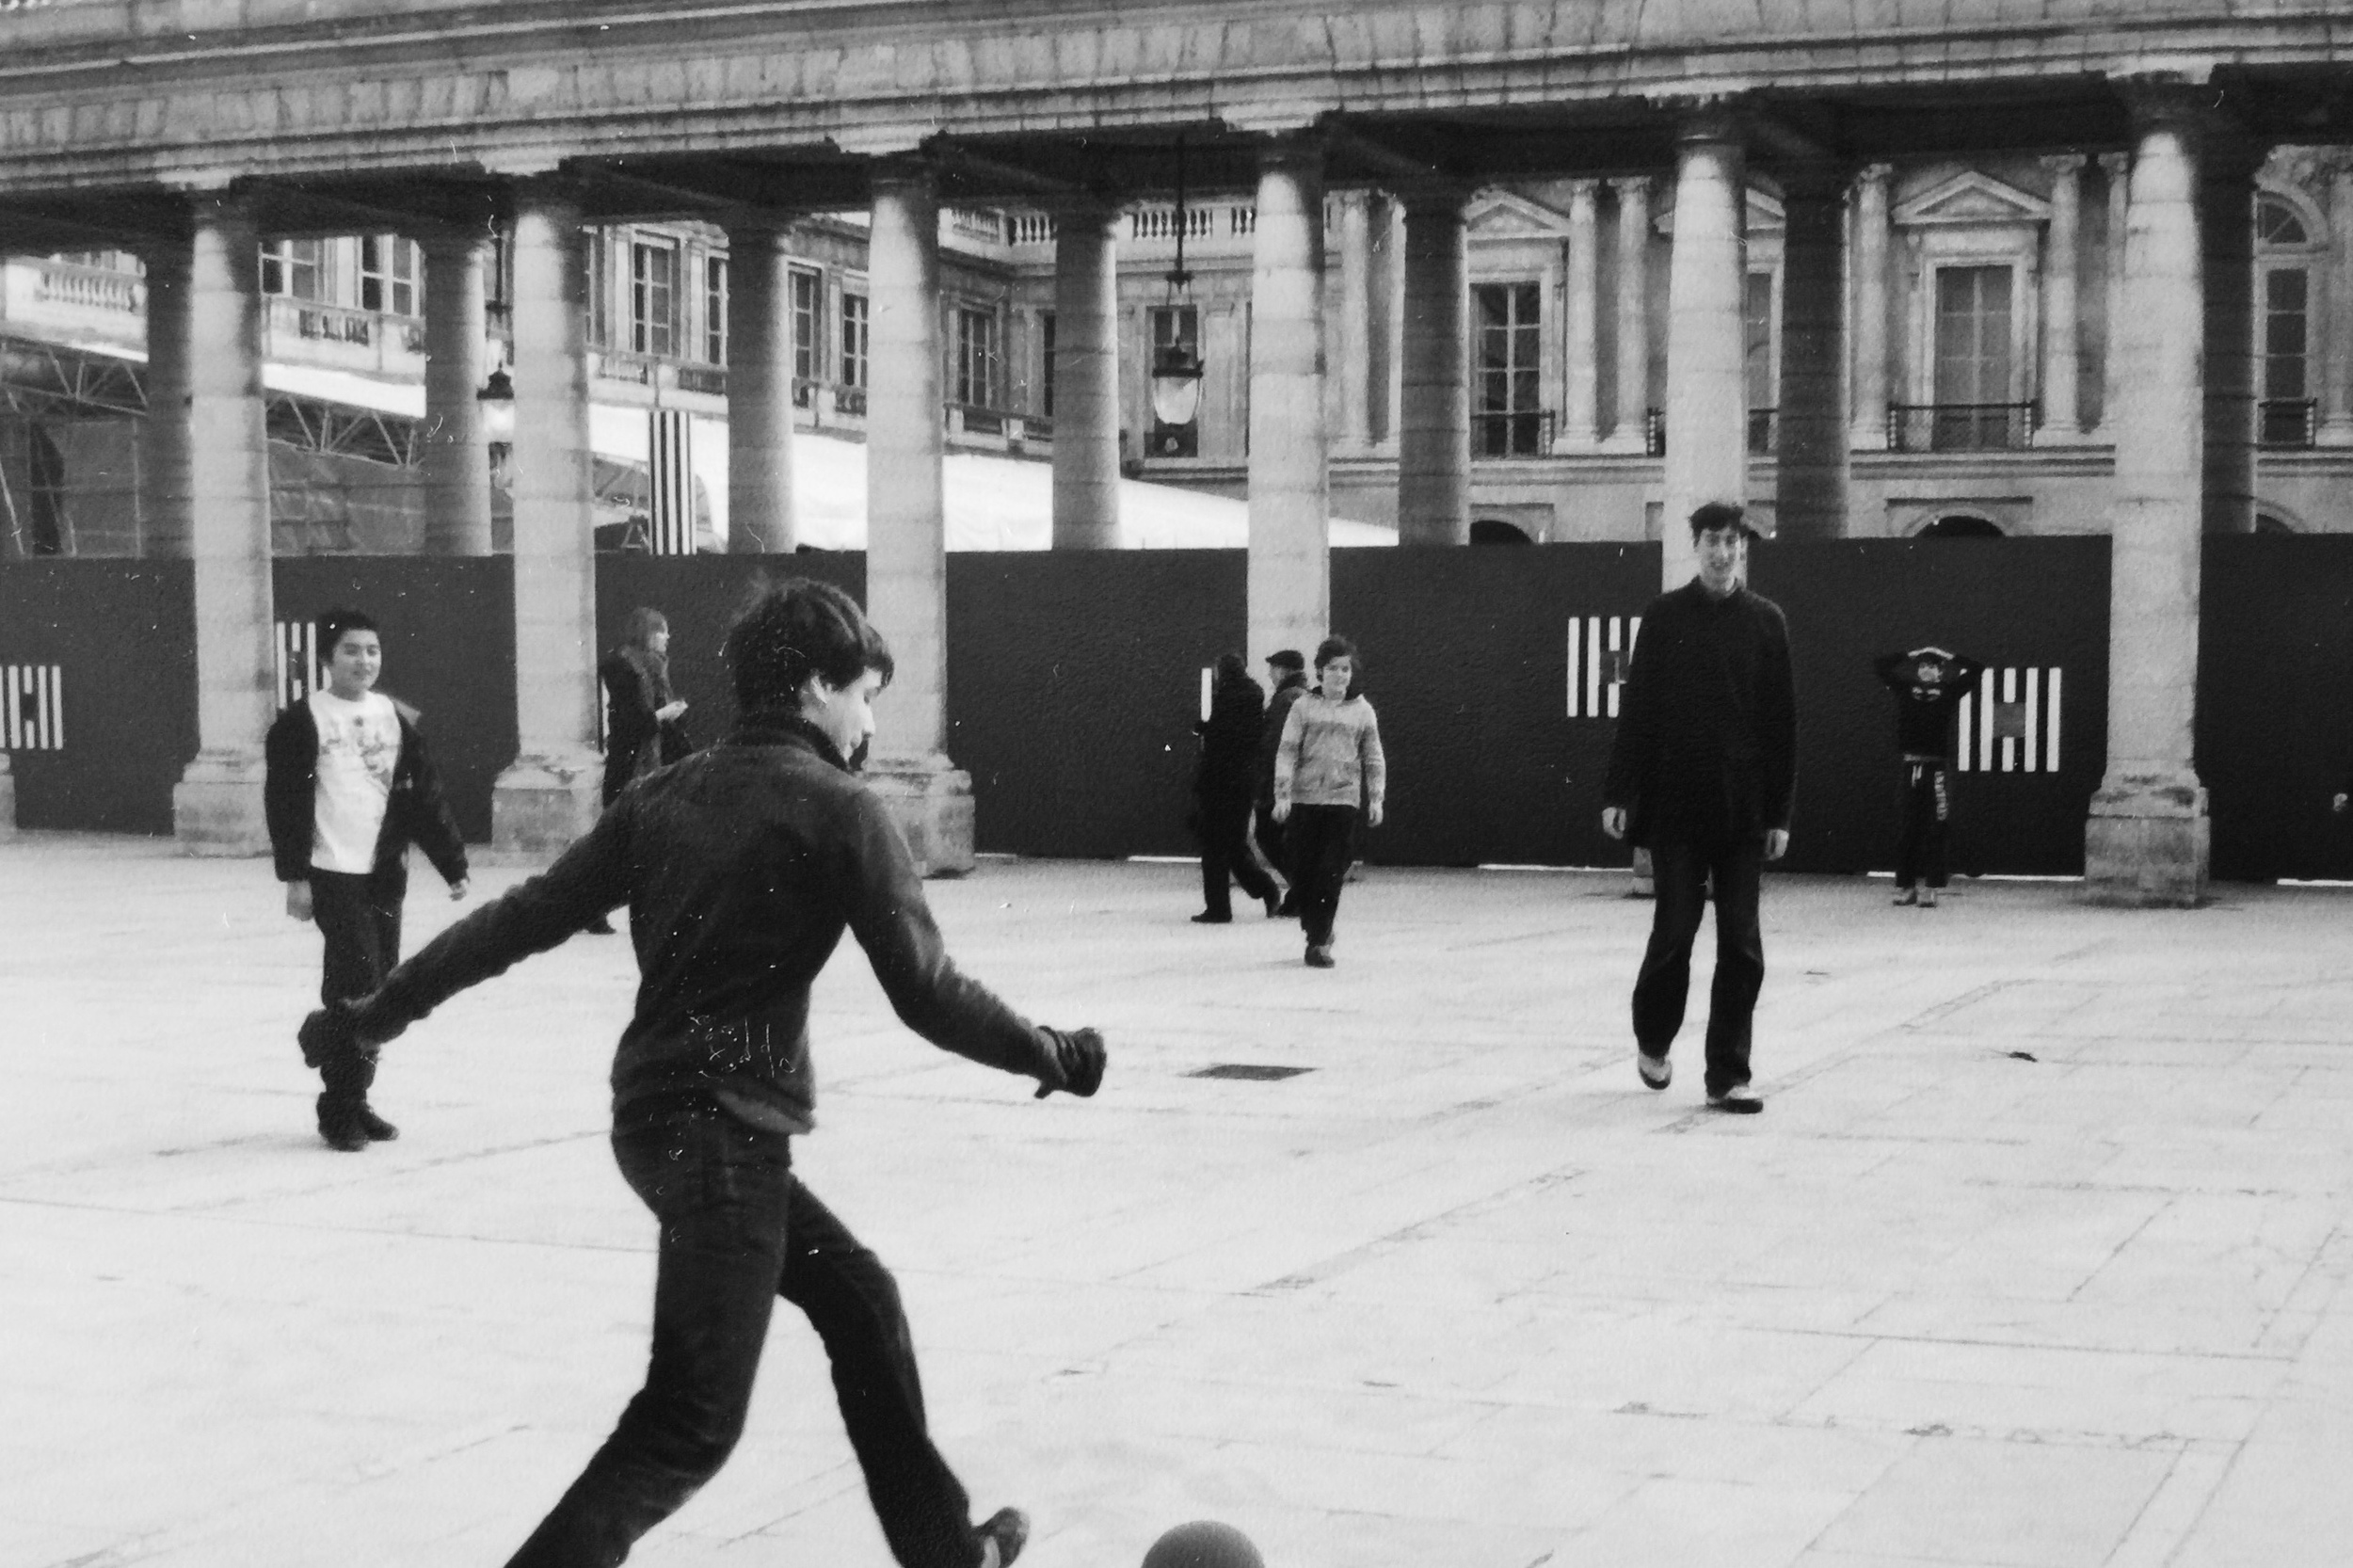 Boys playing kickball in Paris by Naomi Yamada